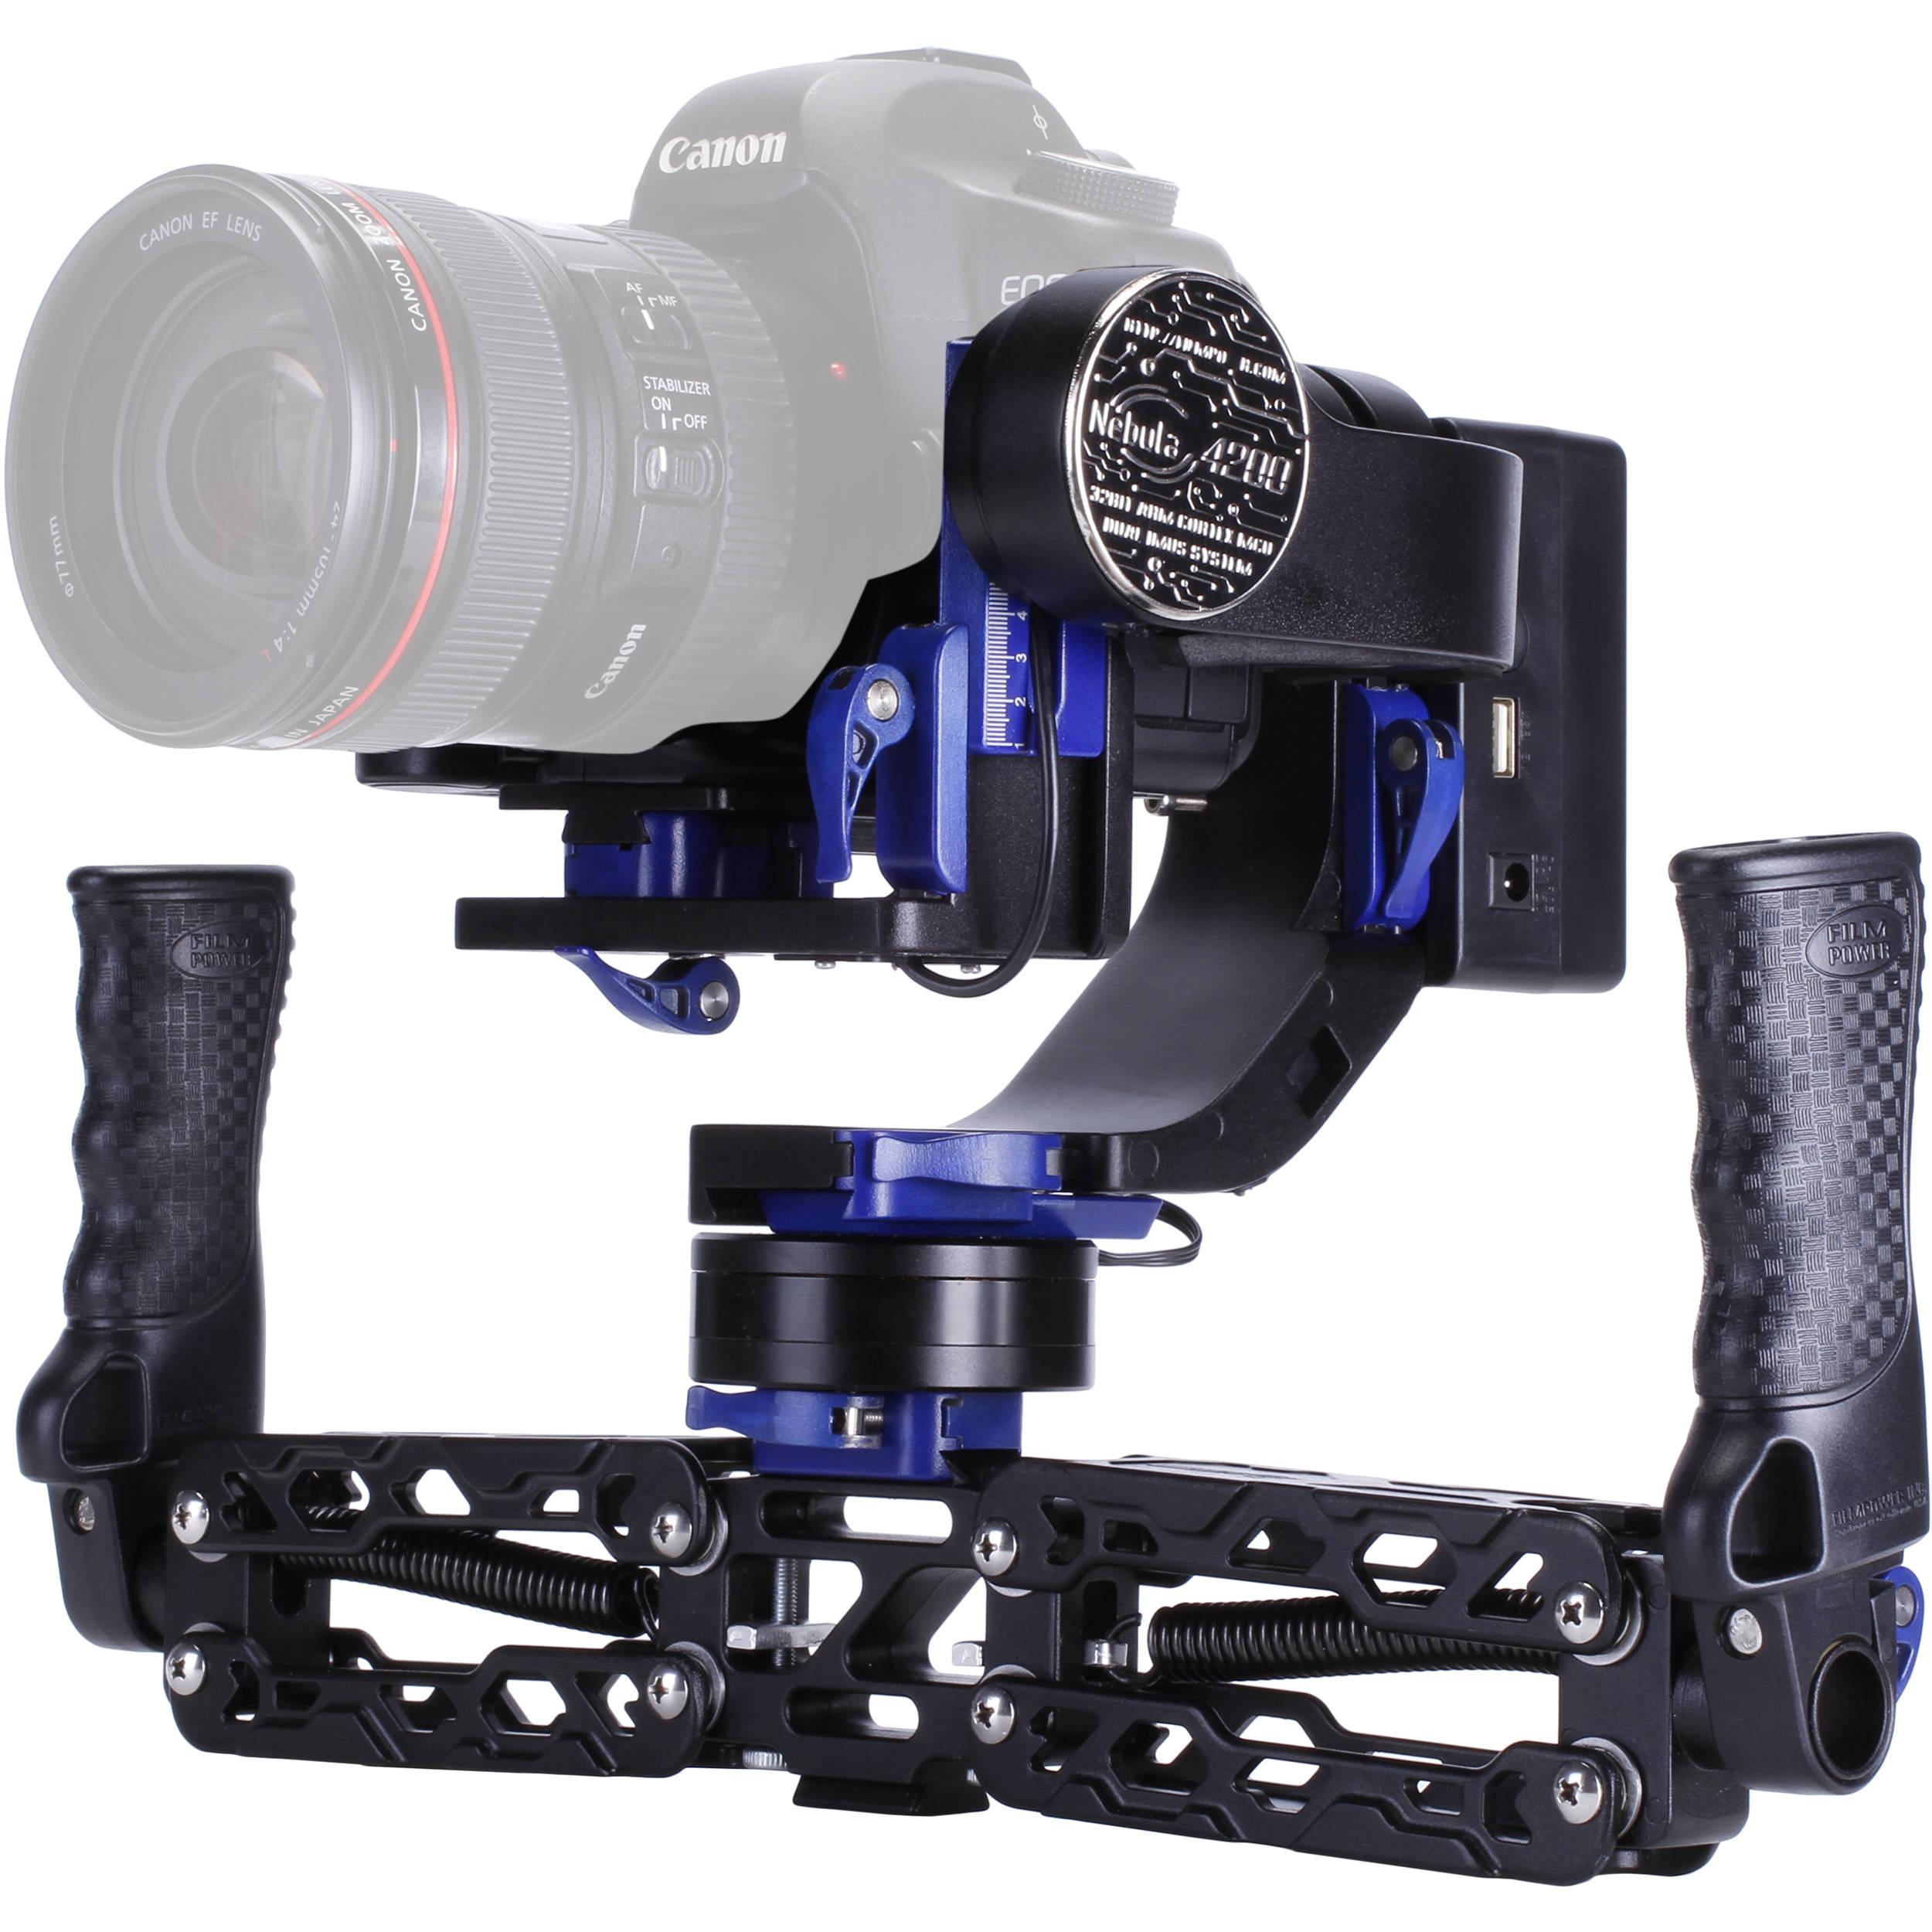 Nebula 4200 5 Axis Gyroscope Stabilizer Nebula 4200 5 Axis B Amp H